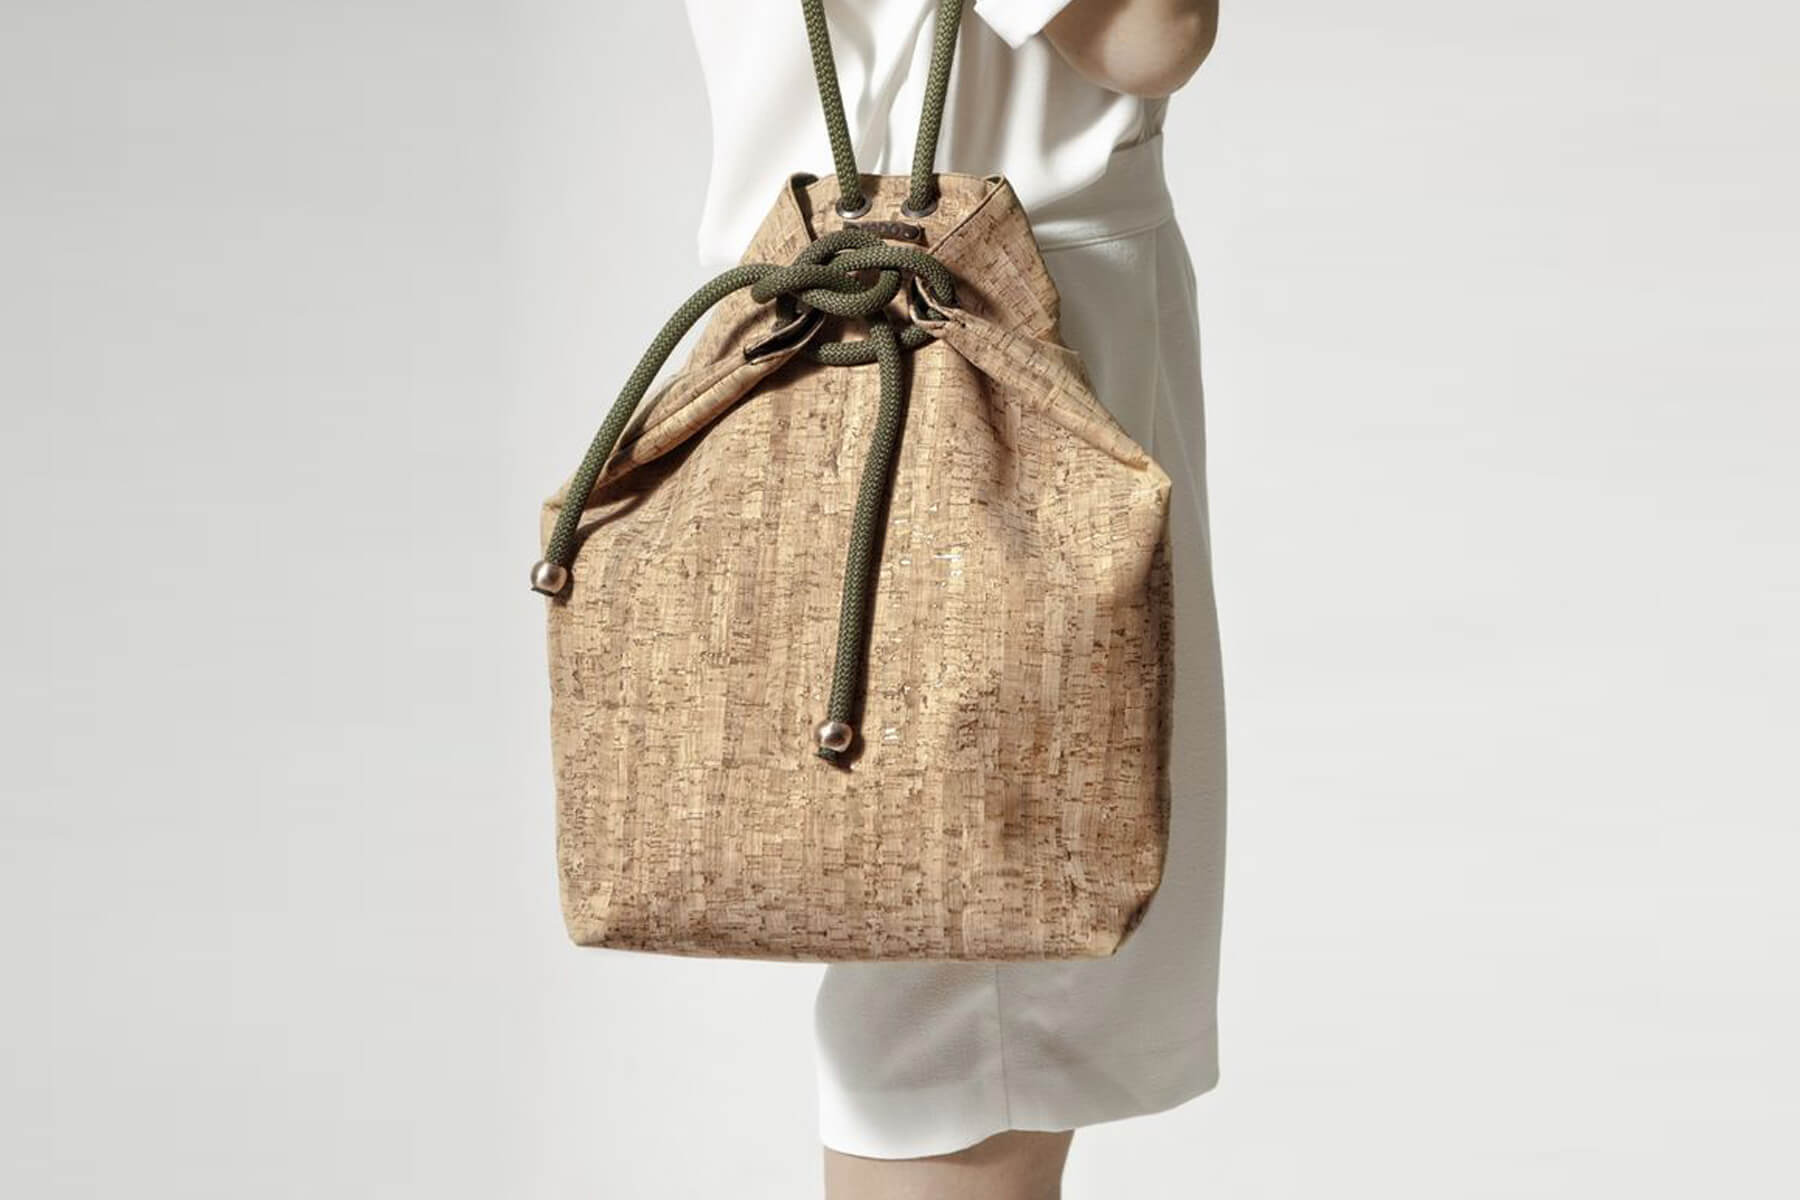 Cork-bag